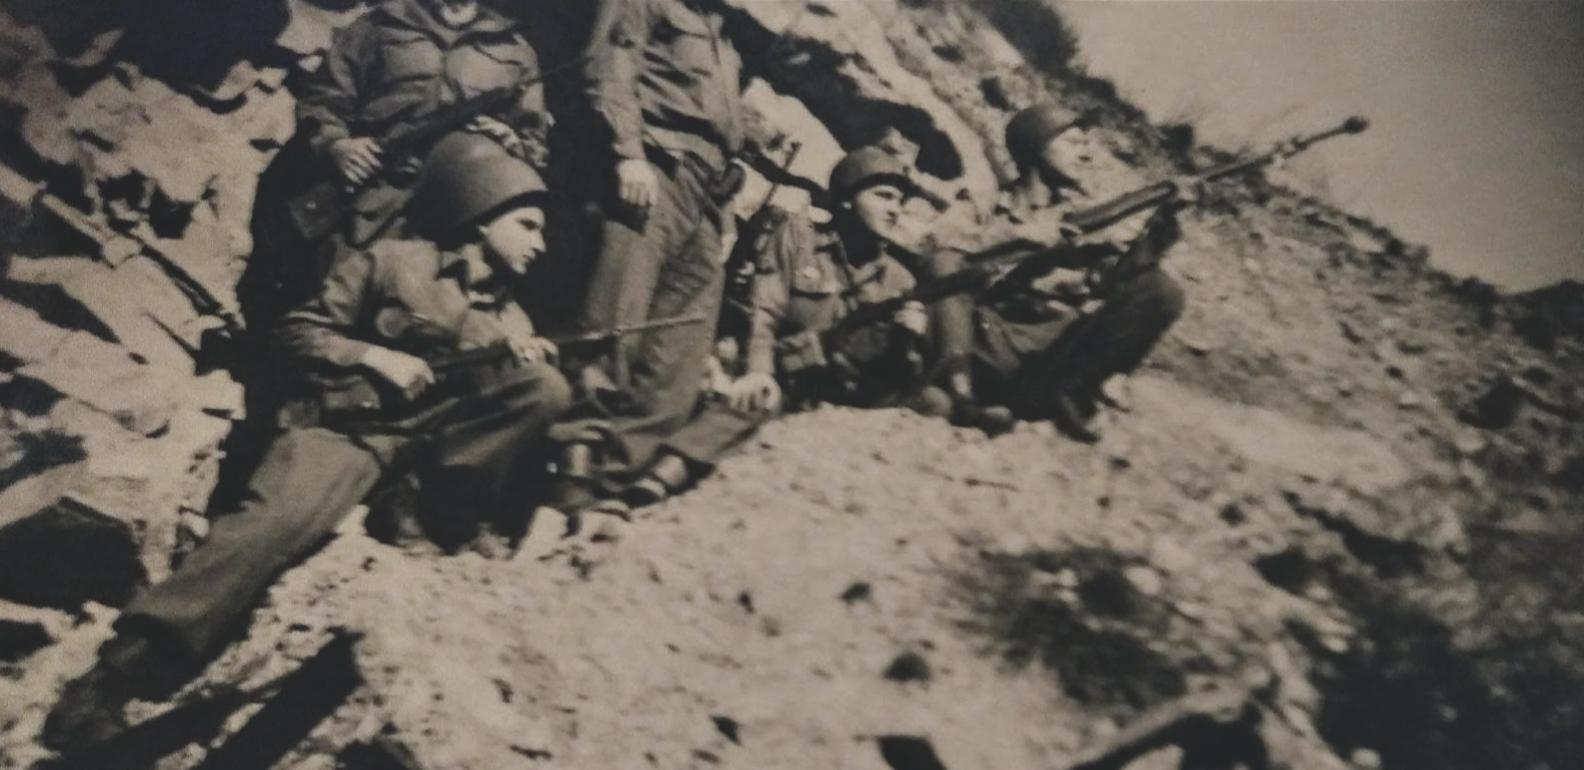 American soldiers in Belgium, 1944. Virginia Kruta/The Daily Caller